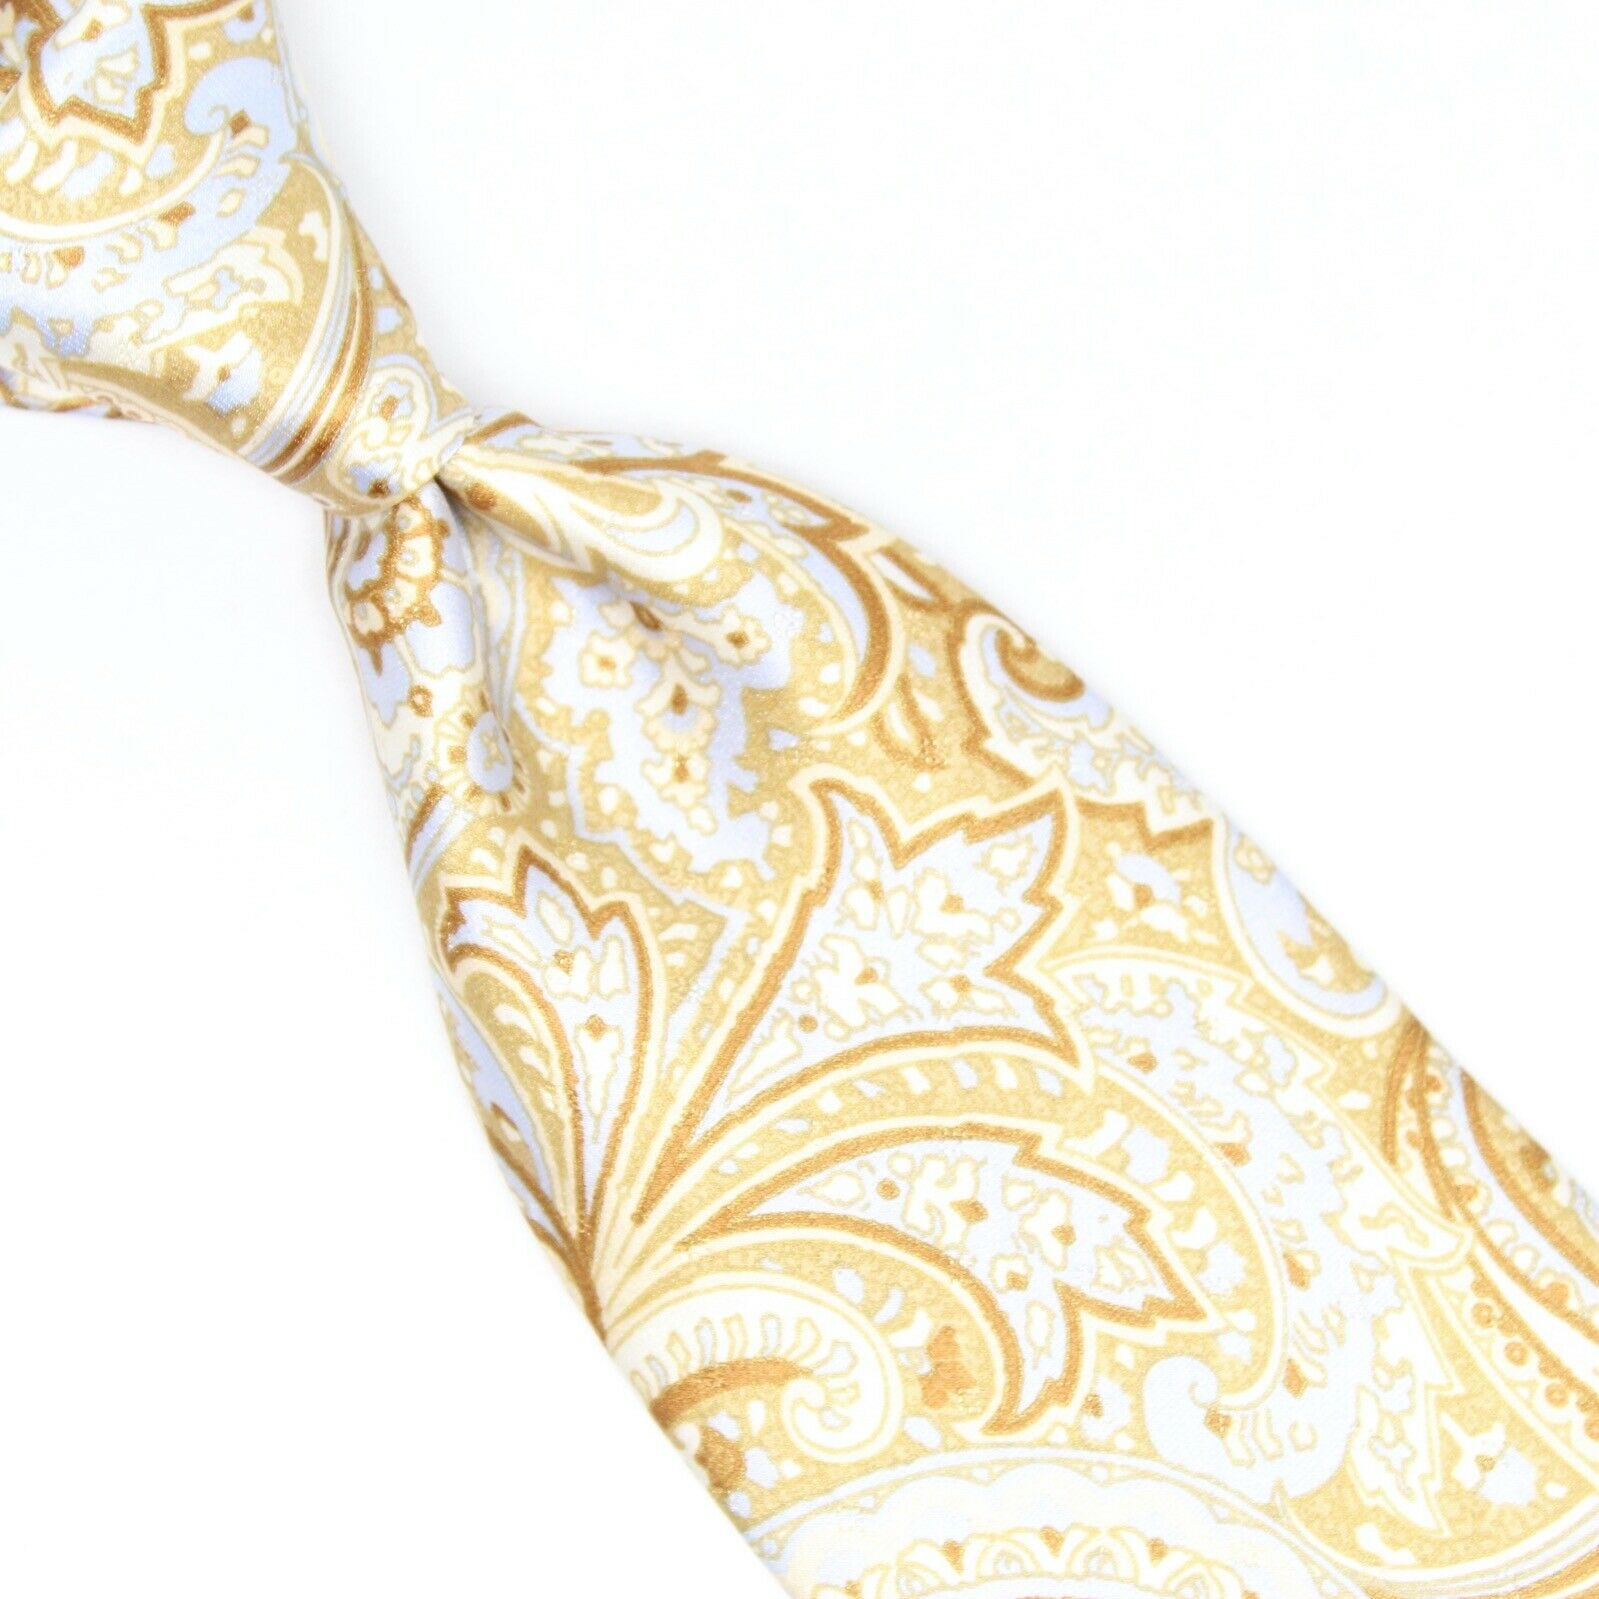 Canali Herren Seide Krawatte Hellblau Gold Paisley Glatt Aufdruck Im Italien